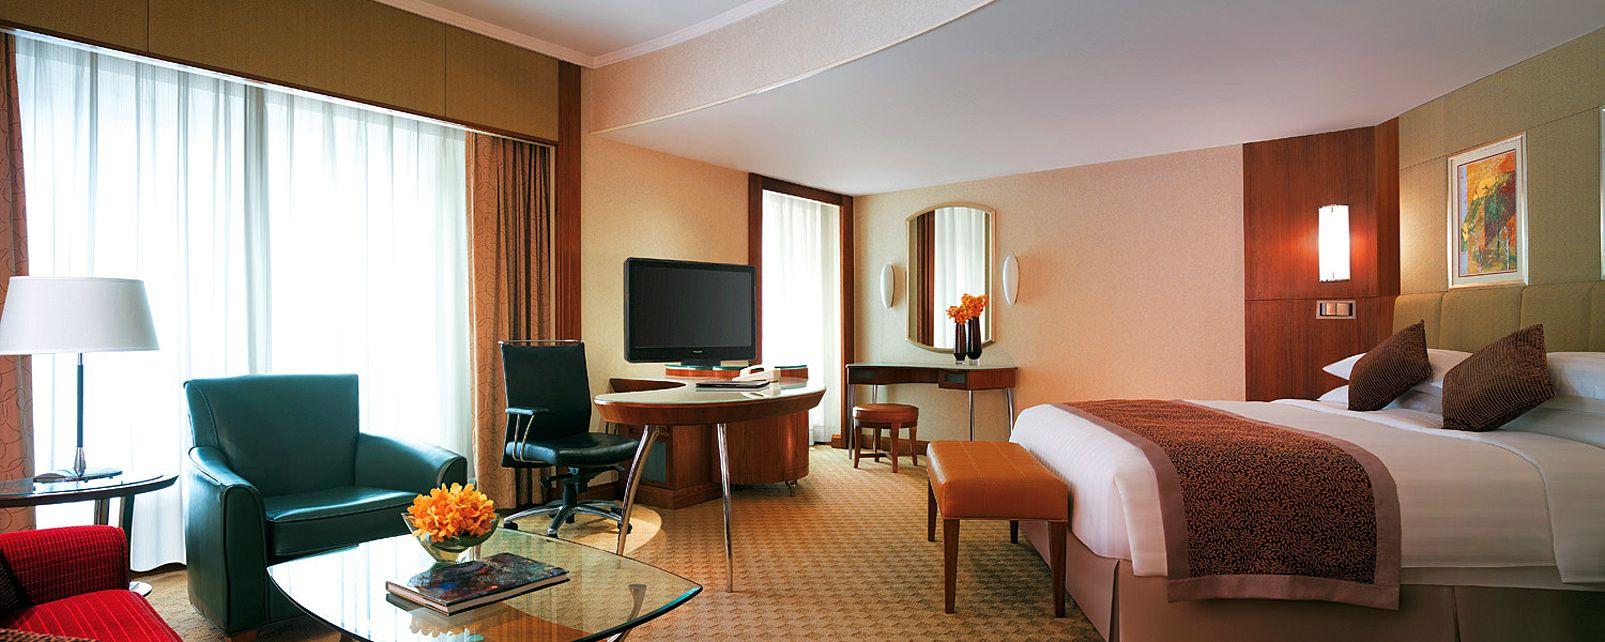 Hôtel Shangri-la China World Hotel